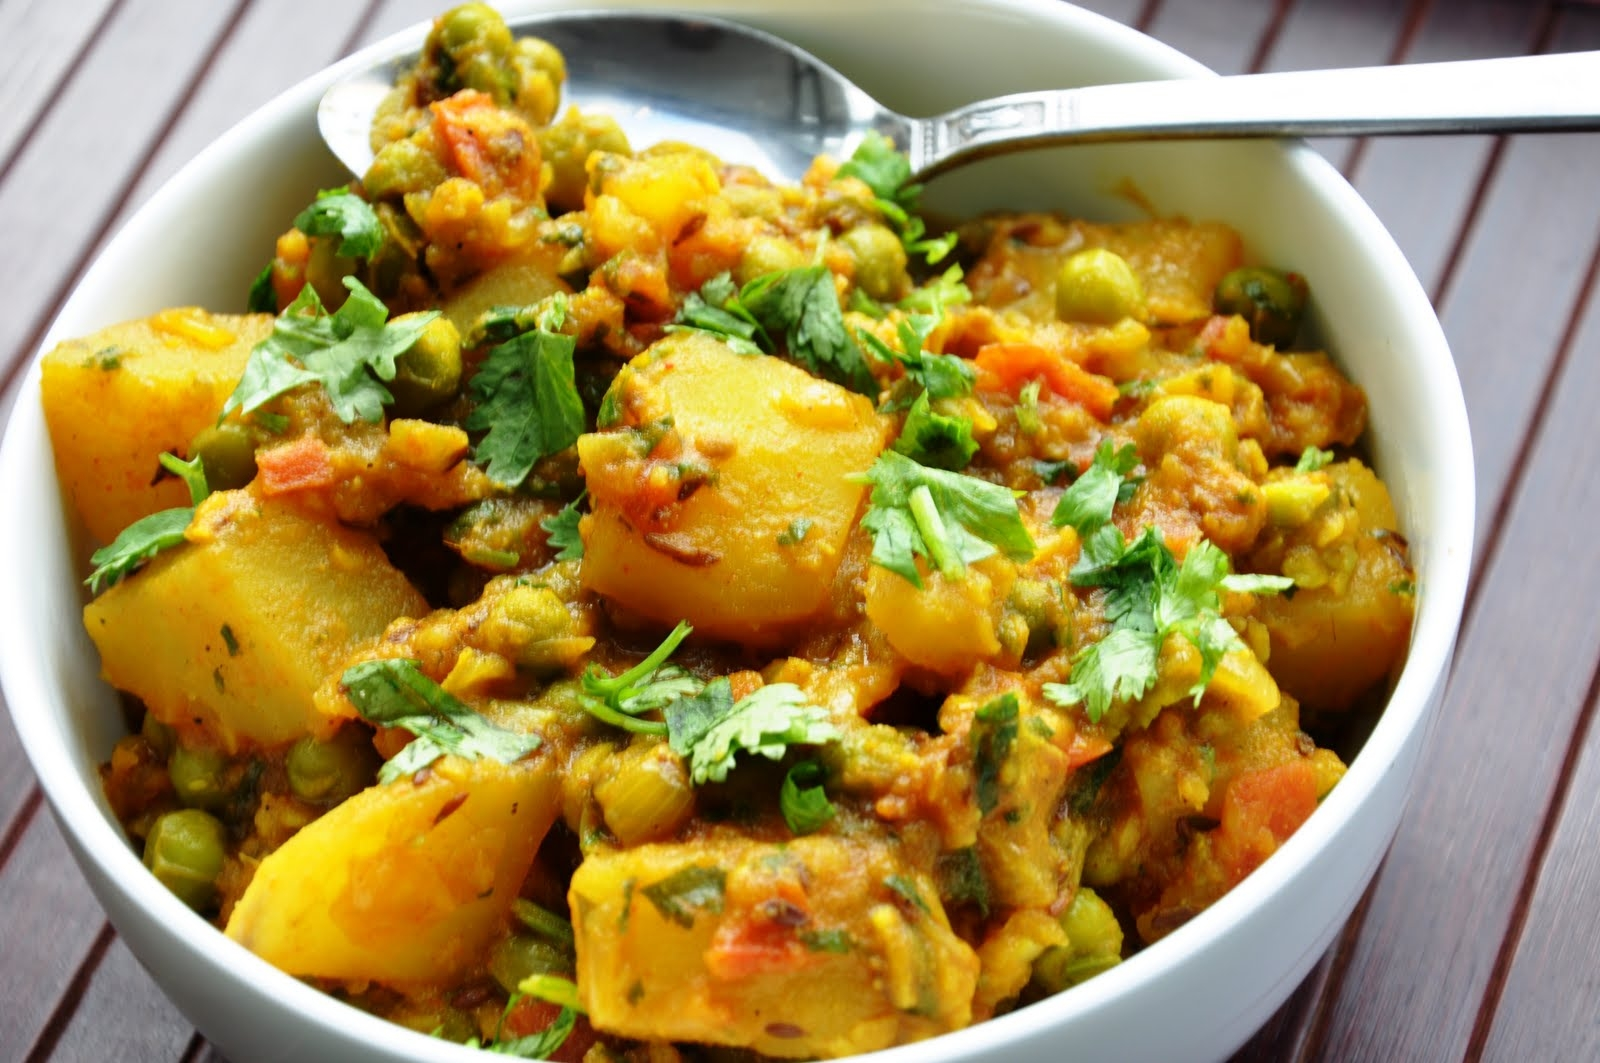 Матар алу таркари - Тушеные овощи с сыром